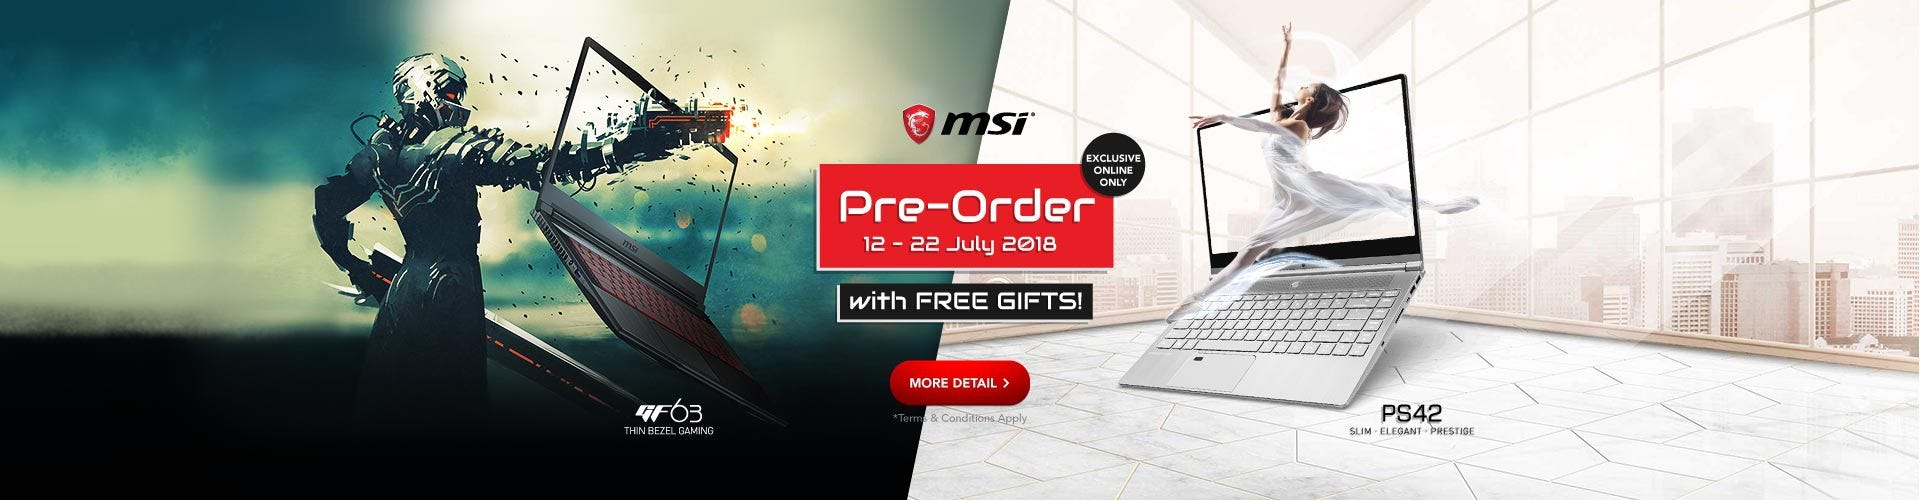 msi-dt-laptop